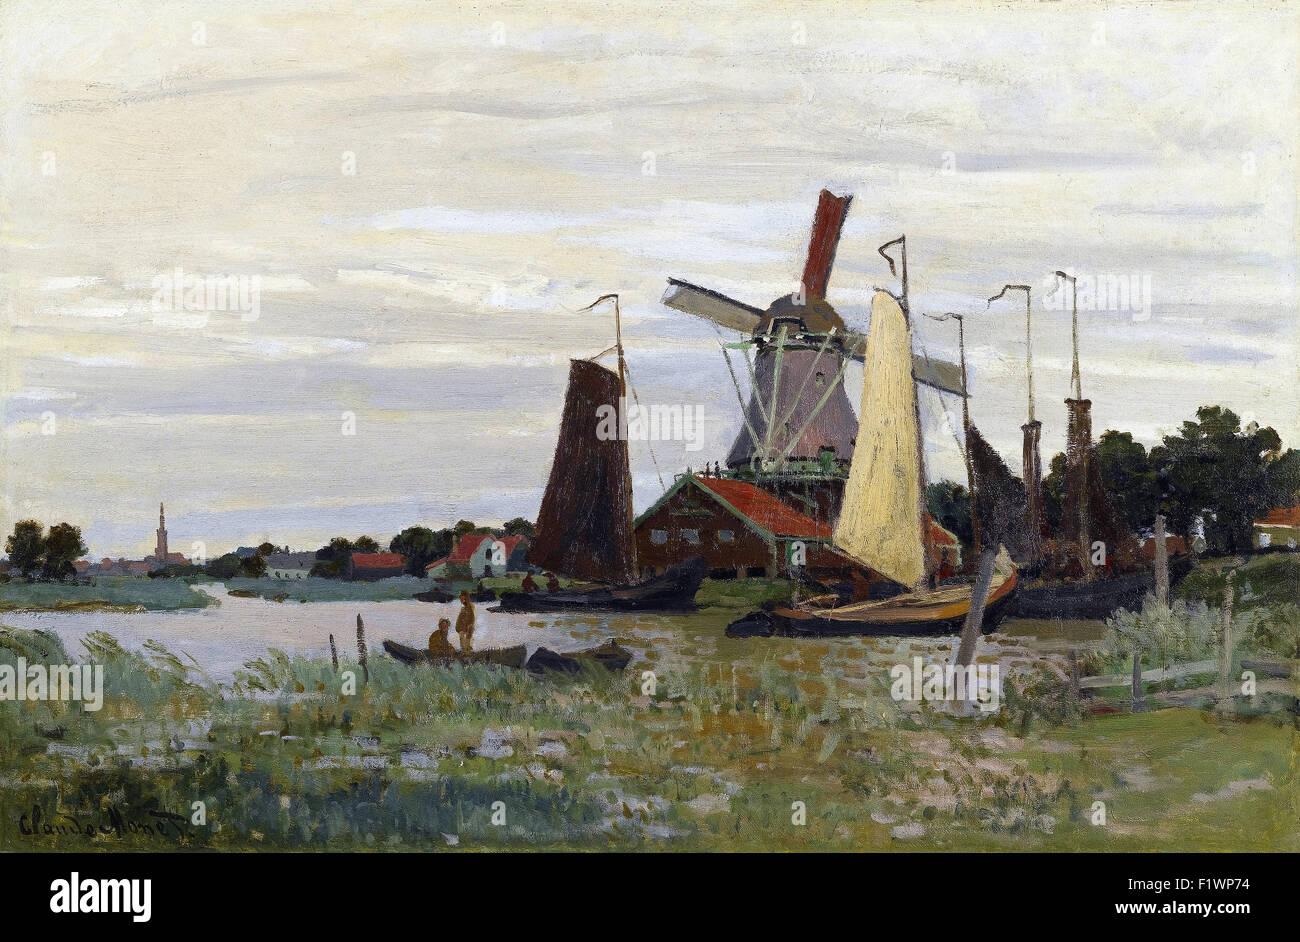 Claude Monet - Un Moulin à Zaandam - Stock Image